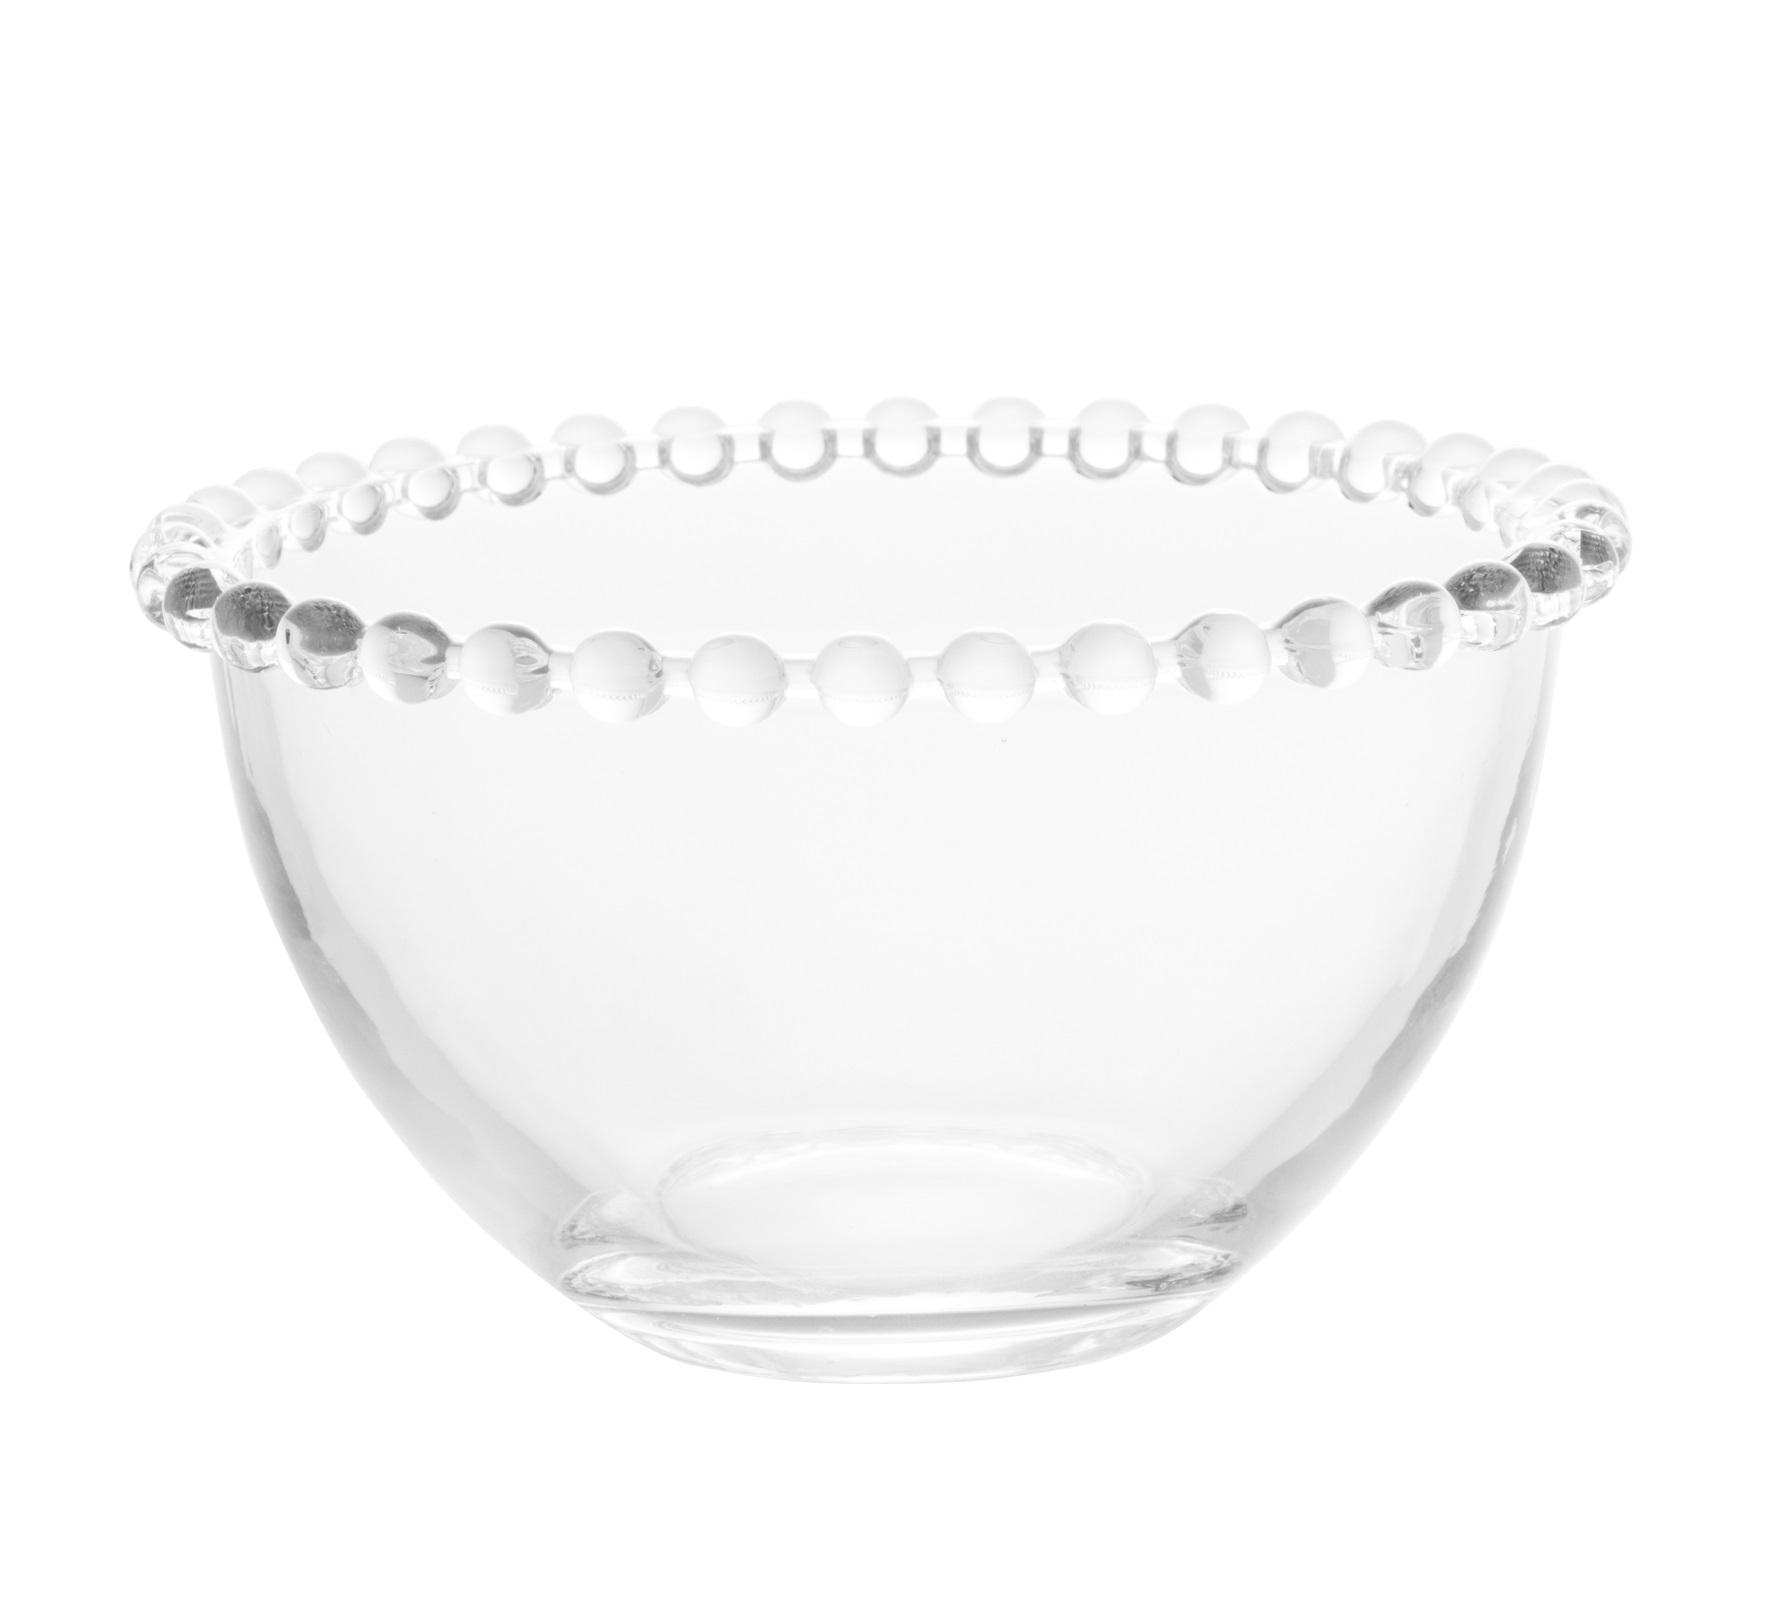 Jogo 4 Bowls Cristal Pearl 14 x 8 cm